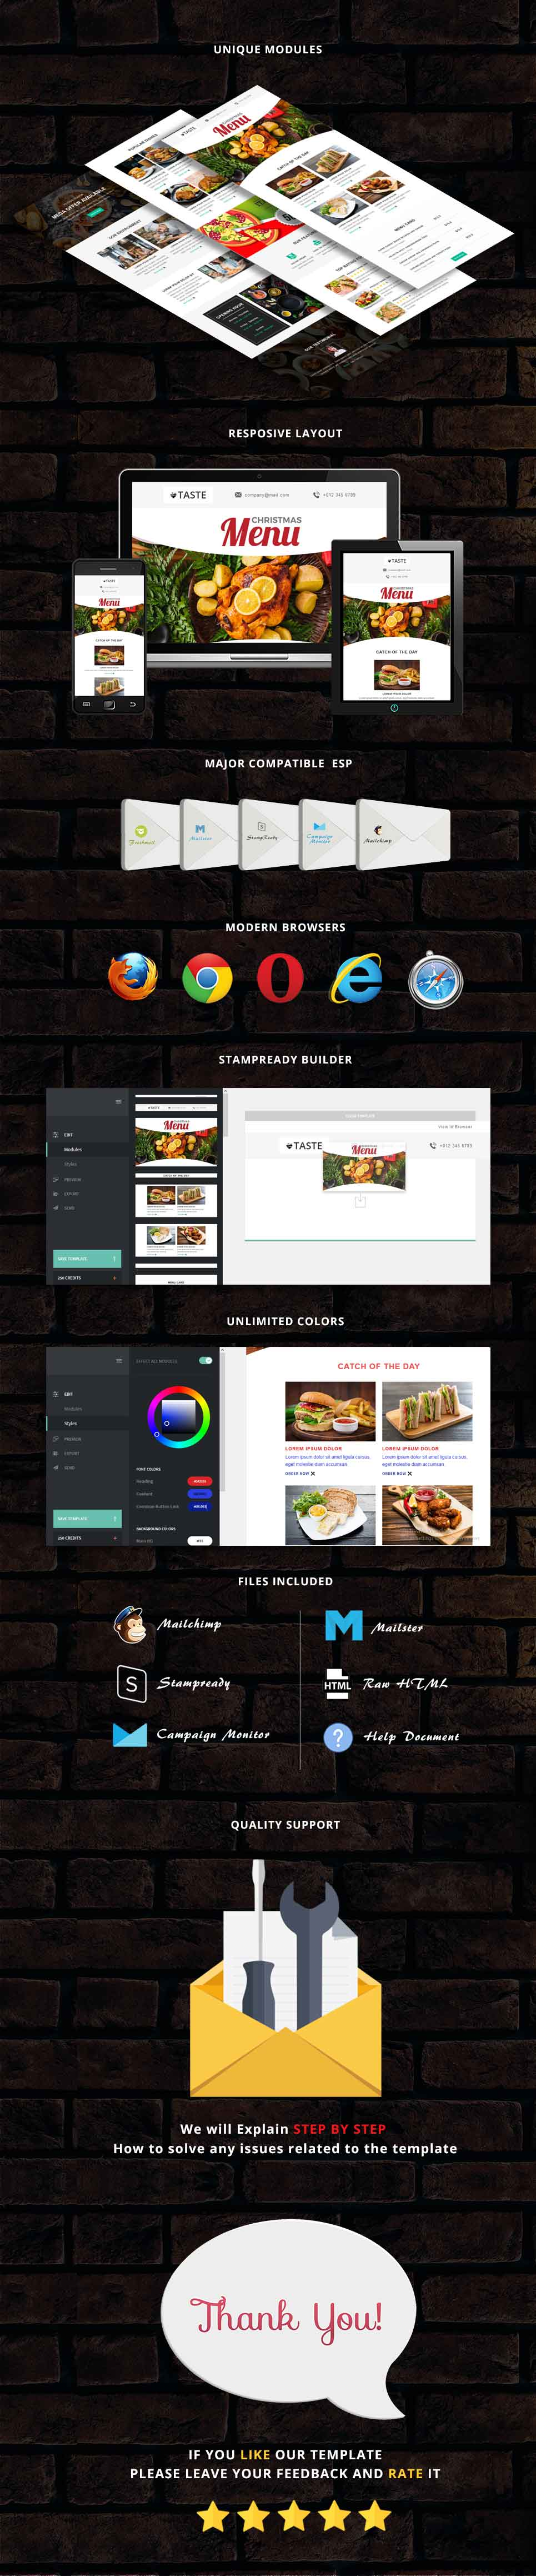 Taste - Restaurant Responsive Email Template + Stampready Builder